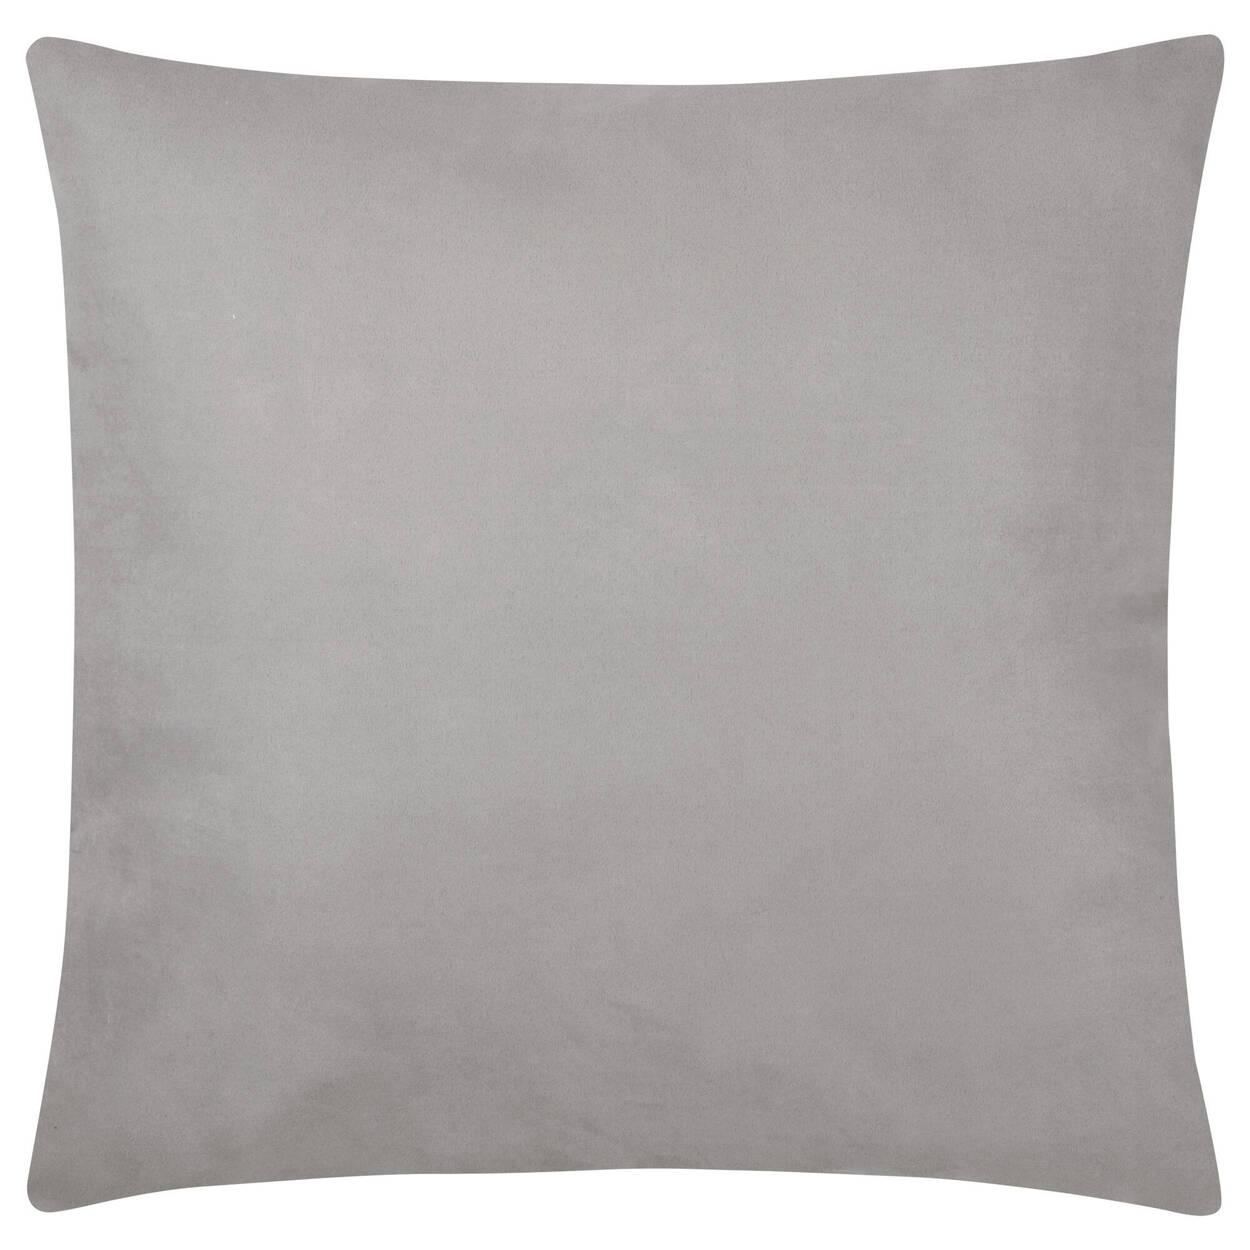 "Milia Decorative Pillow 19"" x 19"""